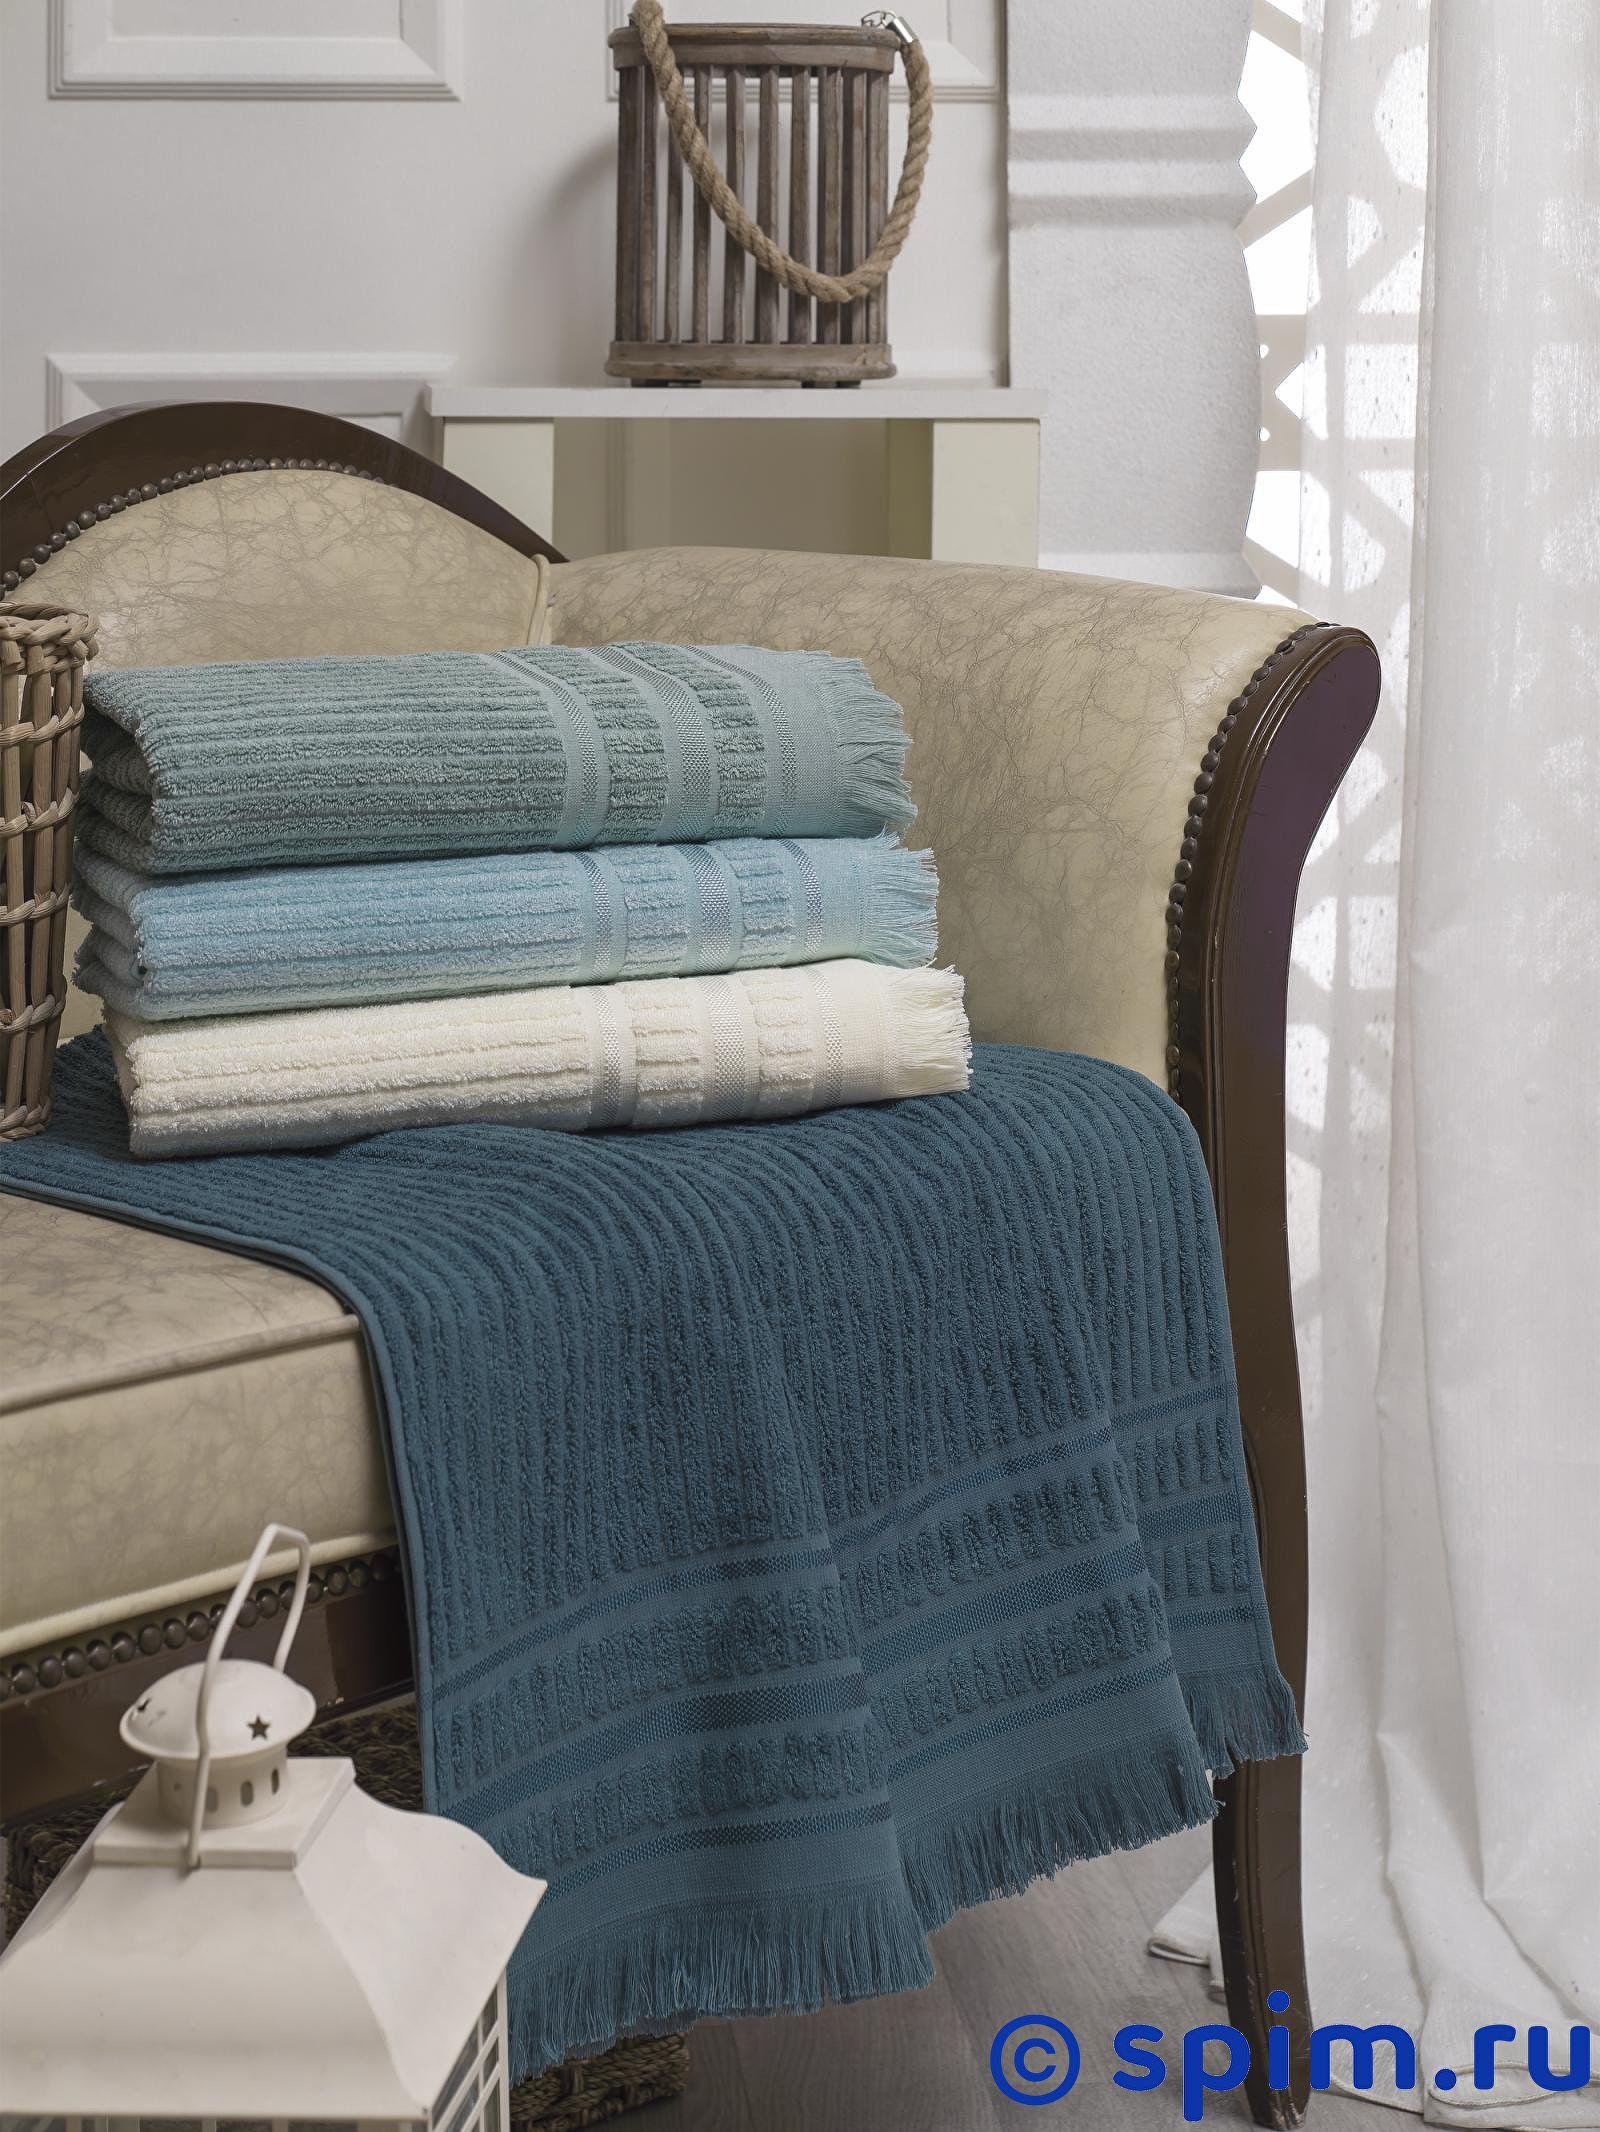 Набор из 4-х полотенец Do&co Melissa 50х90 см полотенца do n co полотенце lady цвет мятный набор